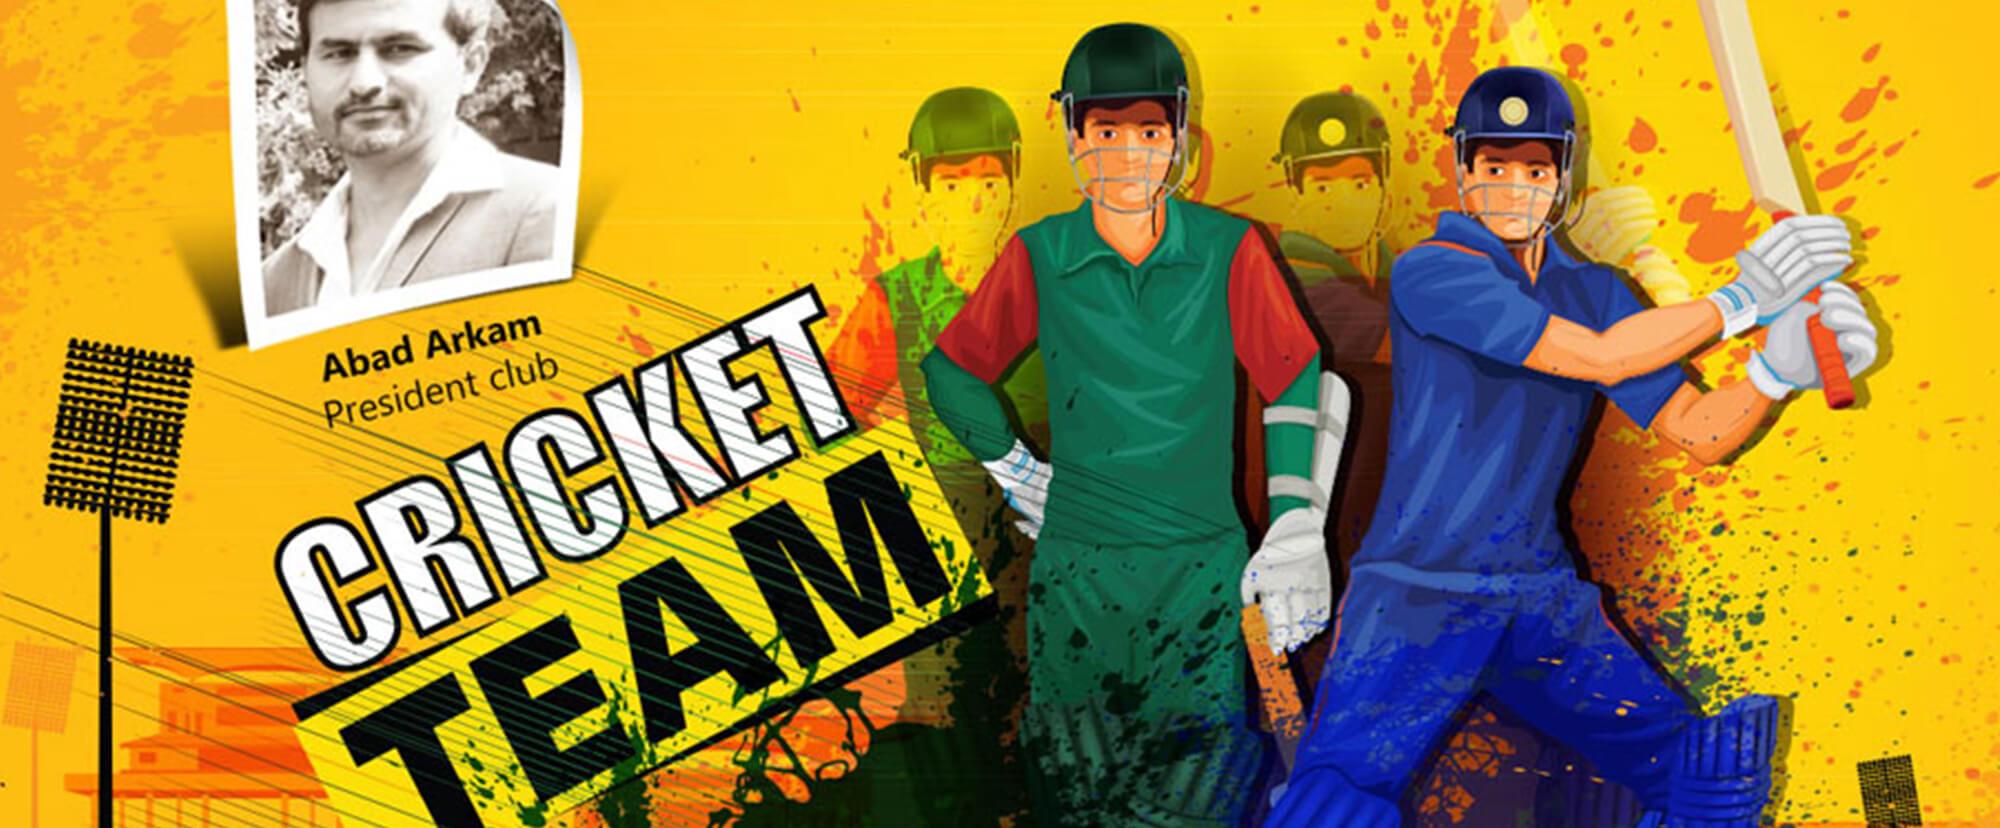 criceket team